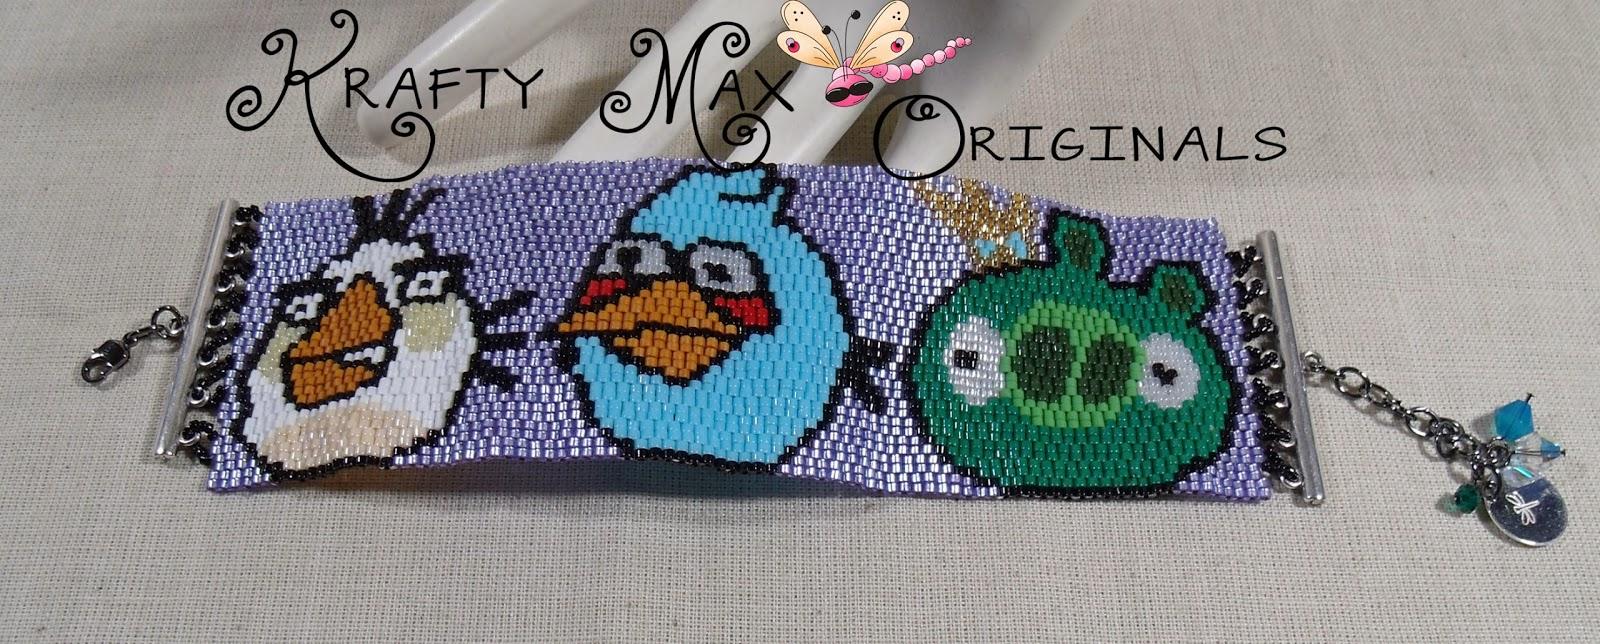 http://www.artfire.com/ext/shop/product_view/KraftyMax/8001727/angry_birds_-_green_pig_blue_bird_and_white_bird_beadwoven_bracelet_/handmade/jewelry/bracelets/beadwork